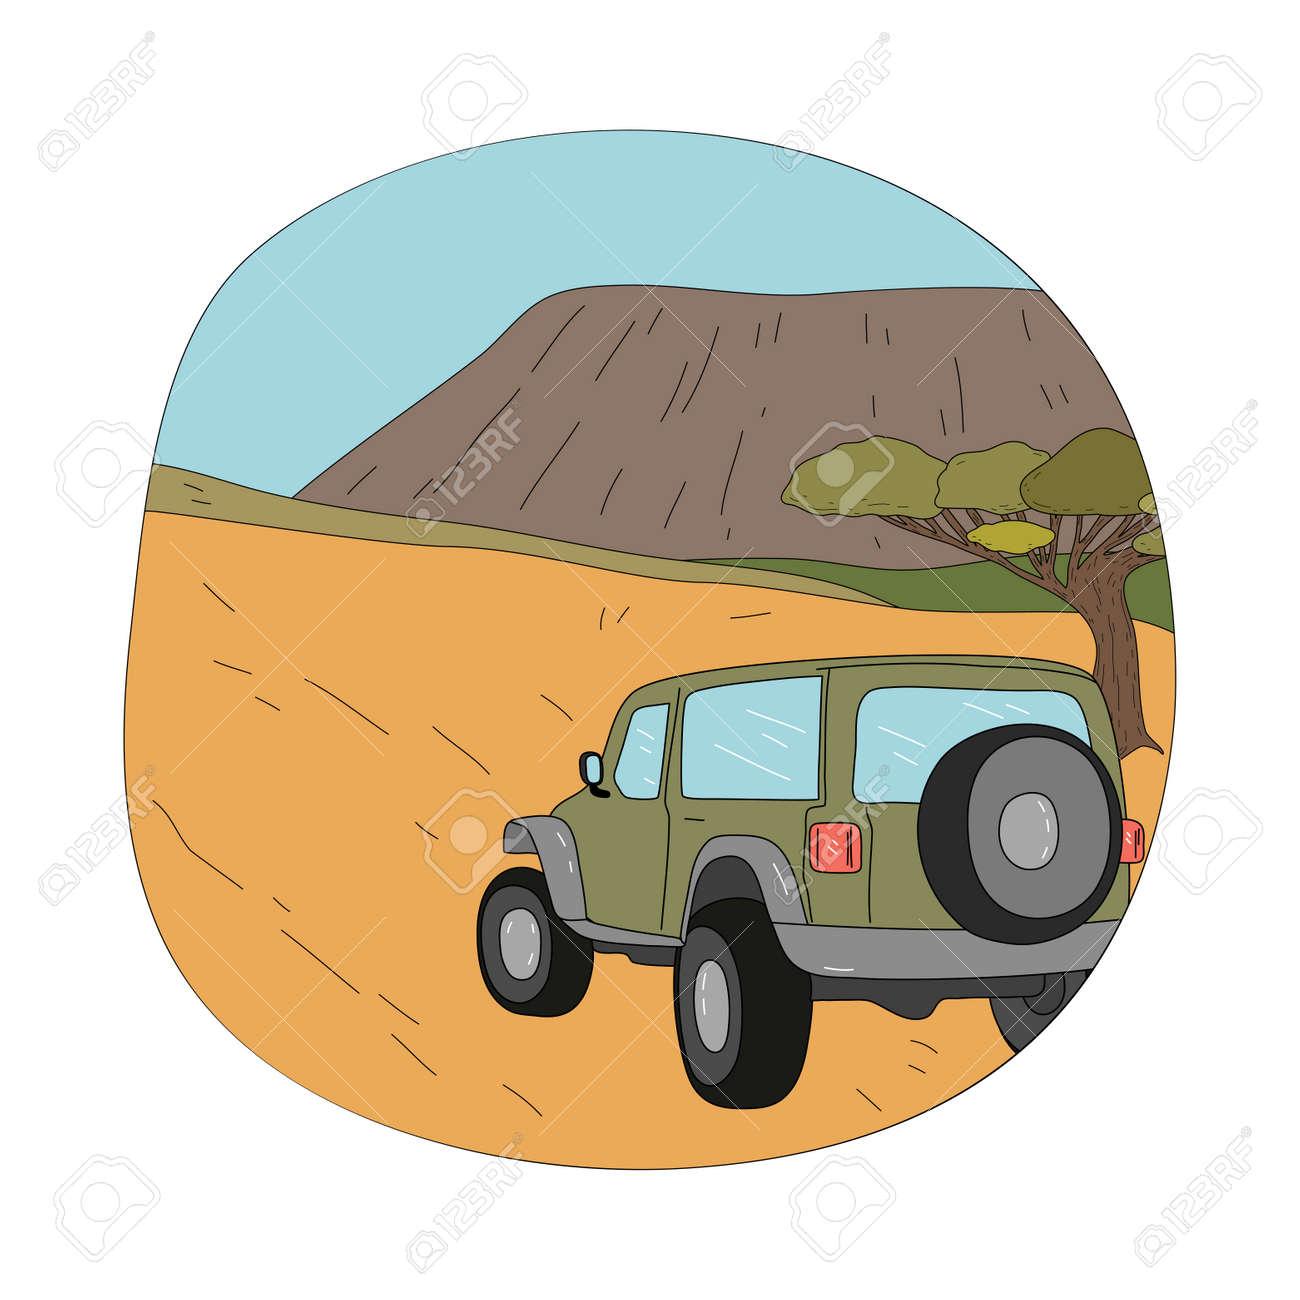 People travelers tourists riding on safari tour in car - 164877068